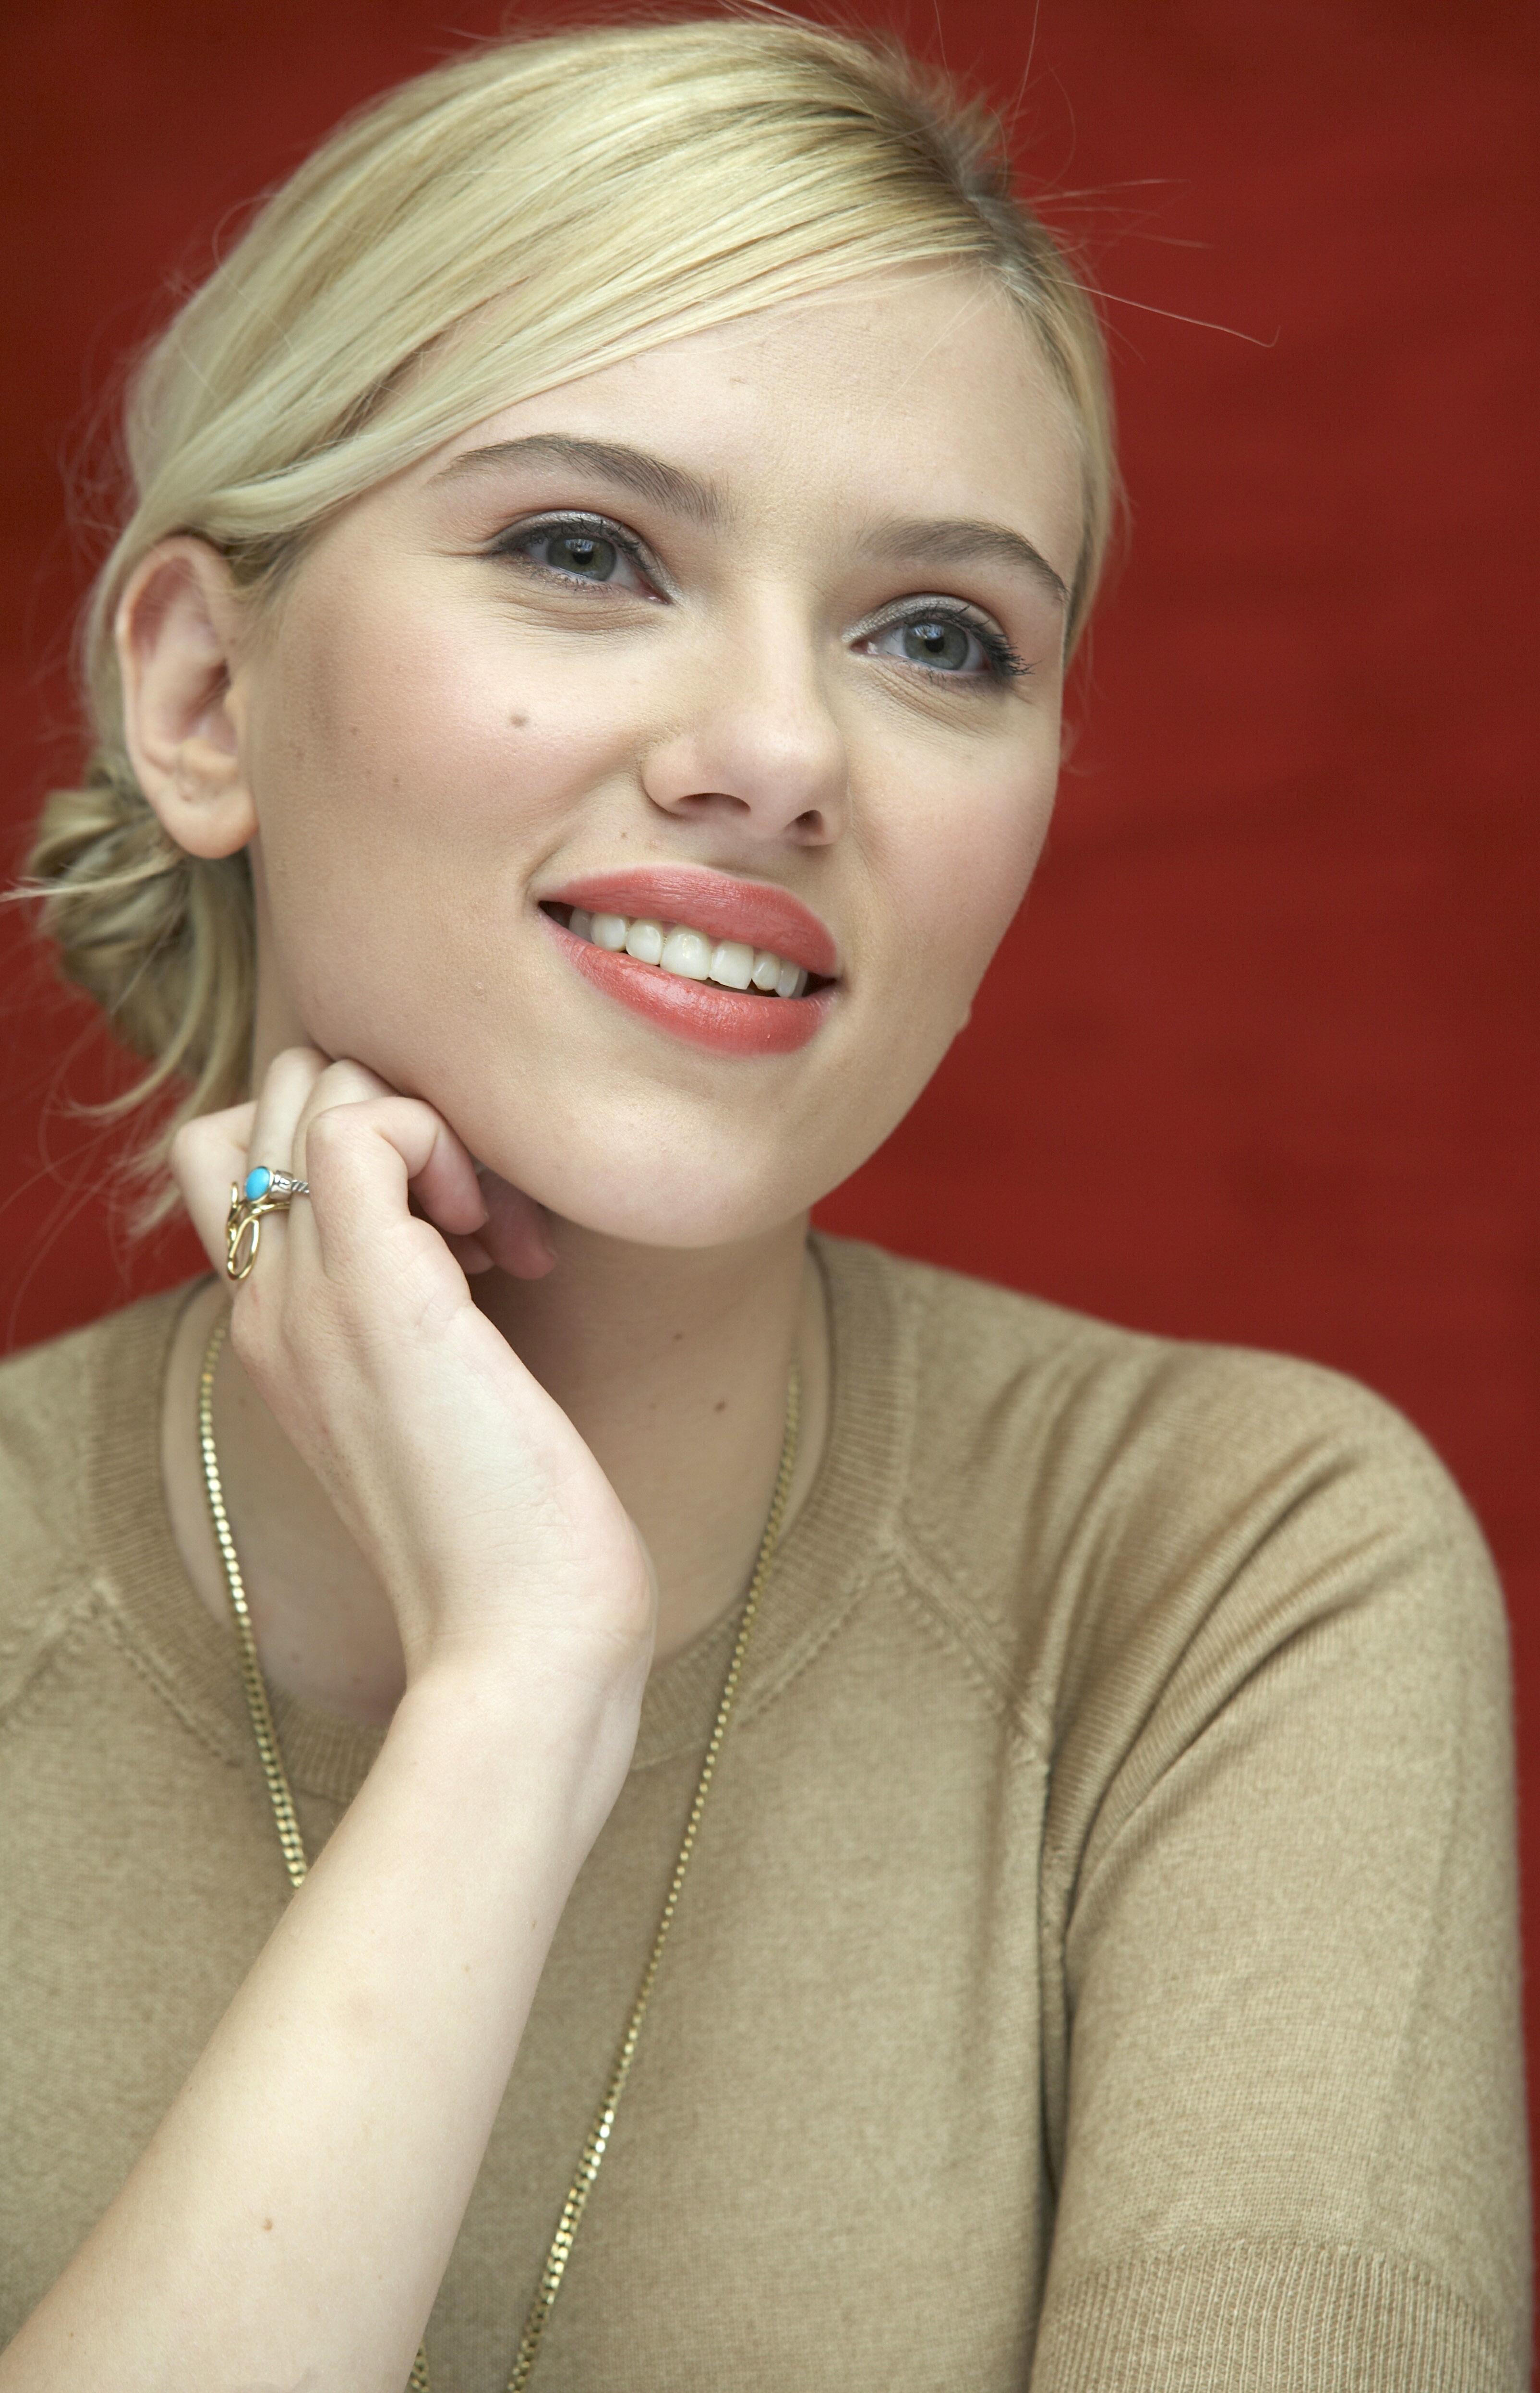 Scarlett Johansson Photo Files